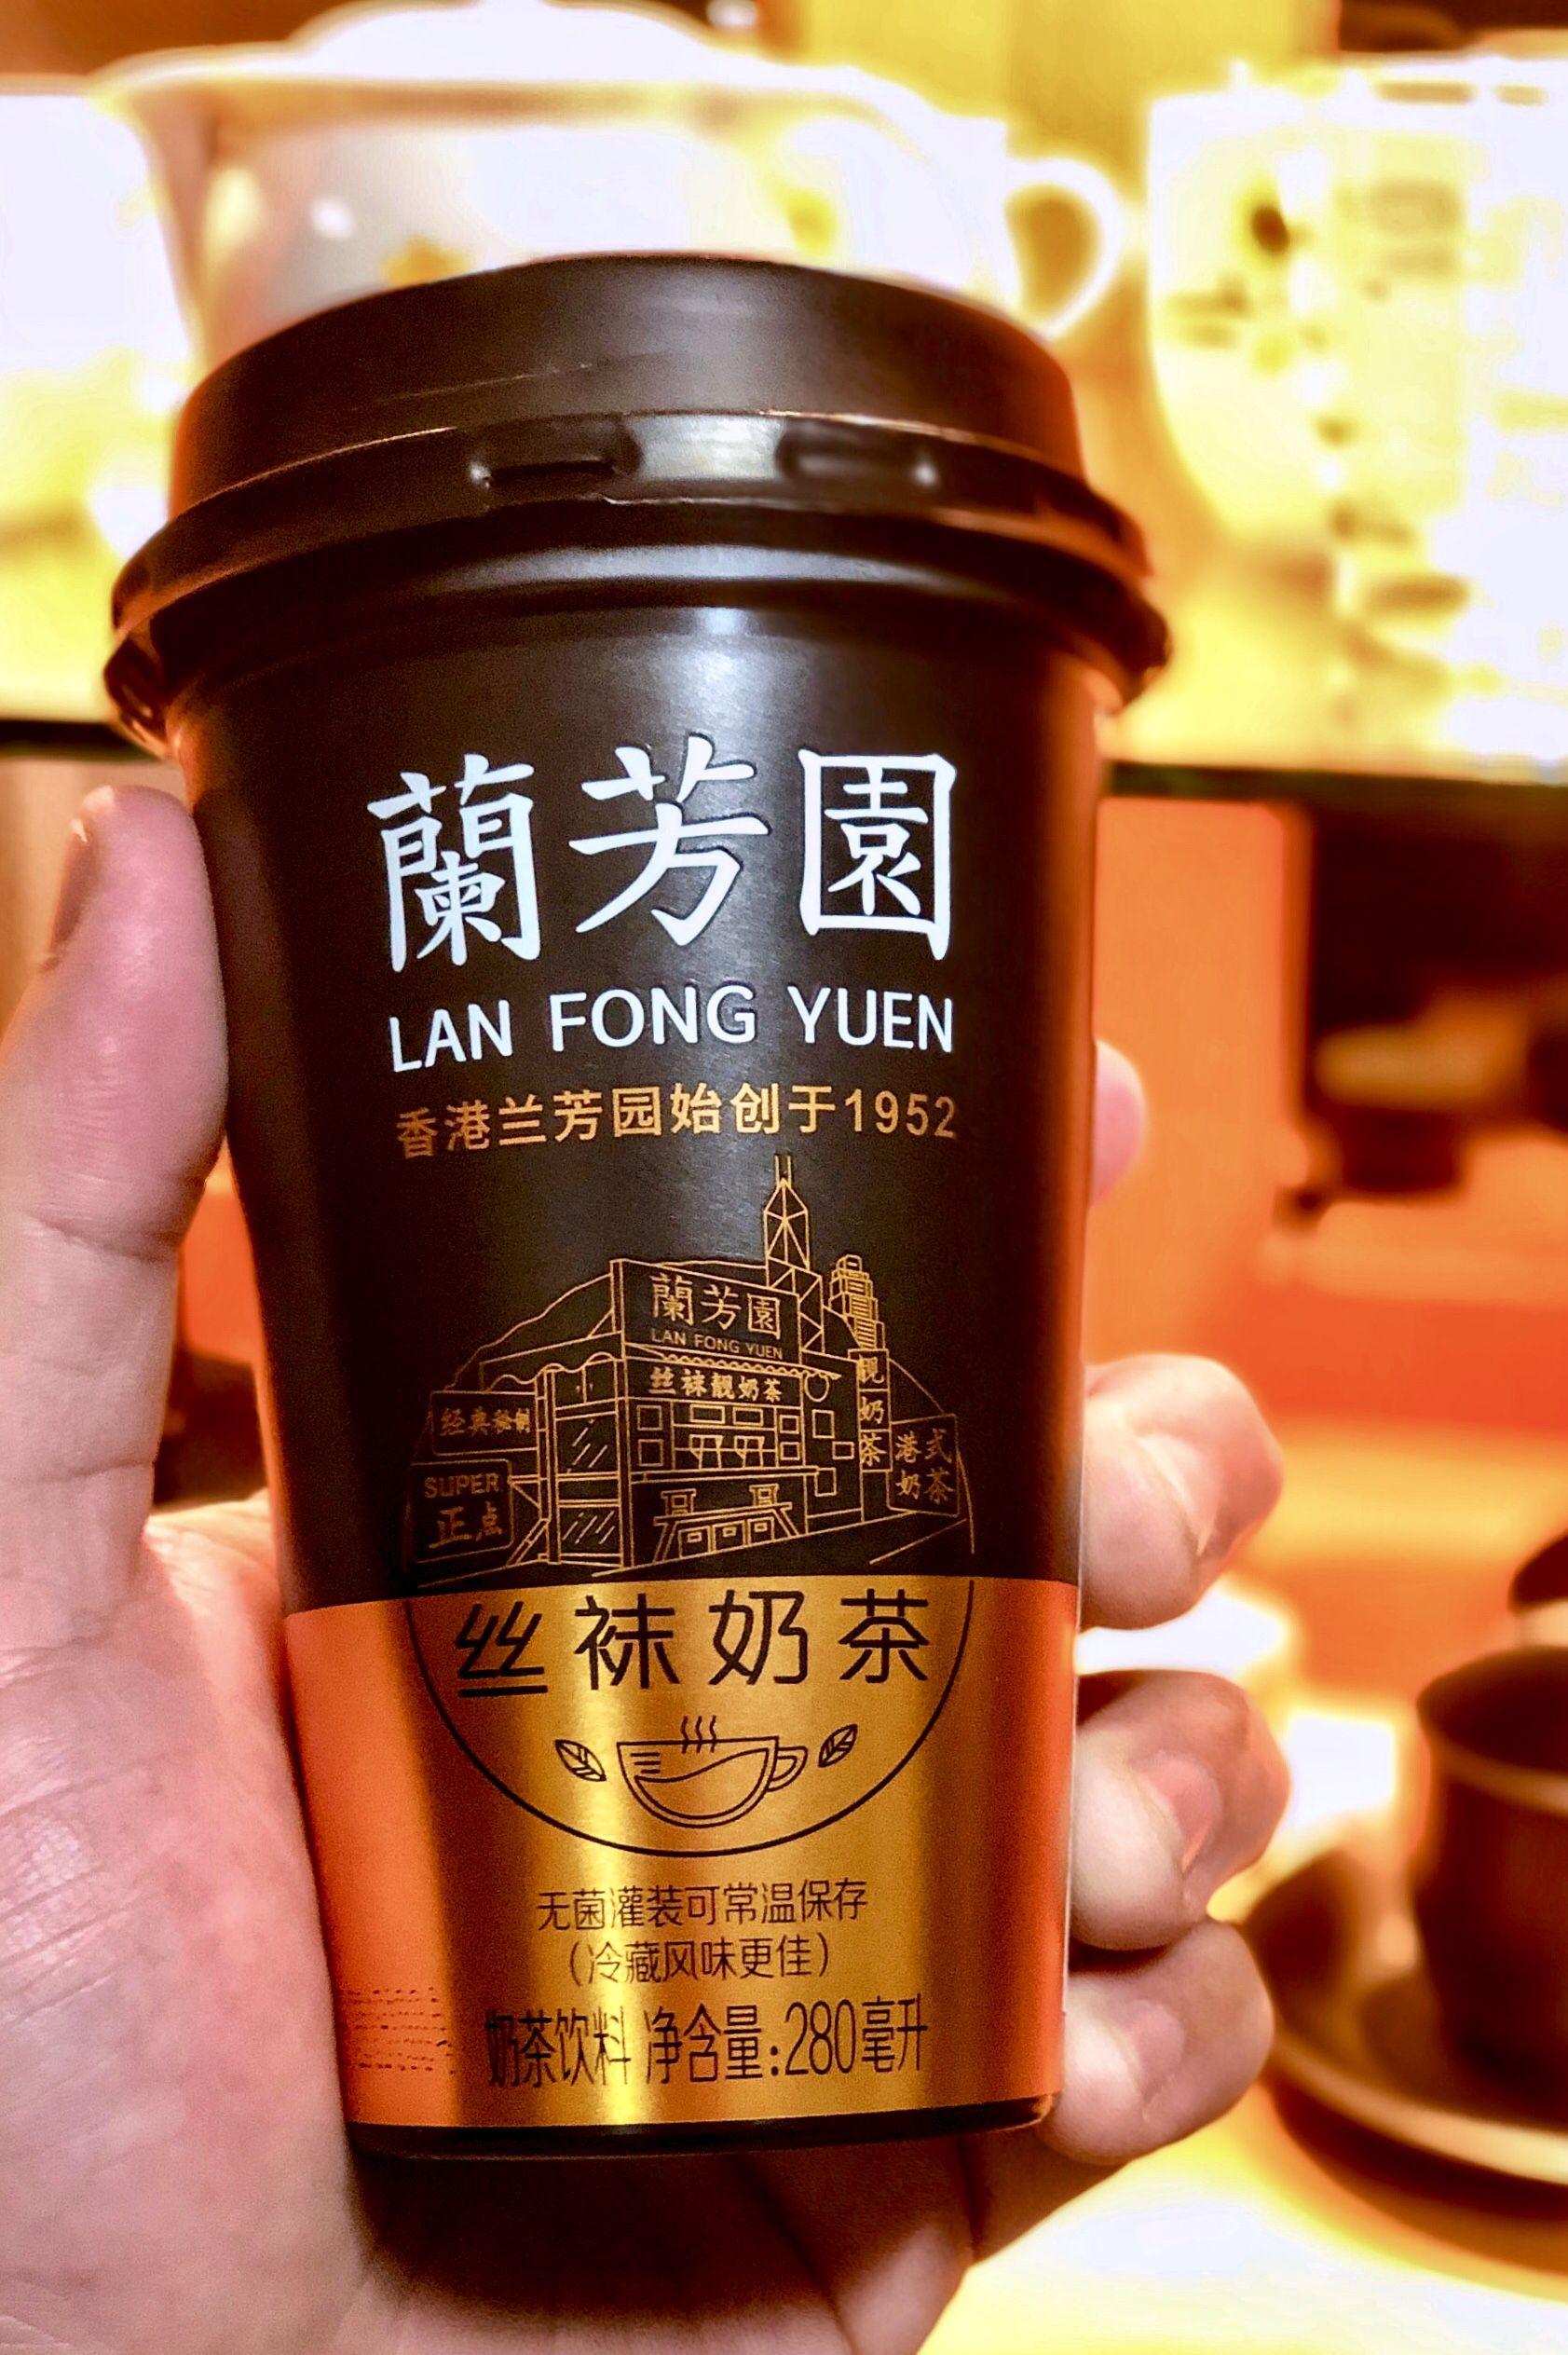 Pin by foxzfile on 2019-吃吃喝喝... | Starbucks iced coffee ...